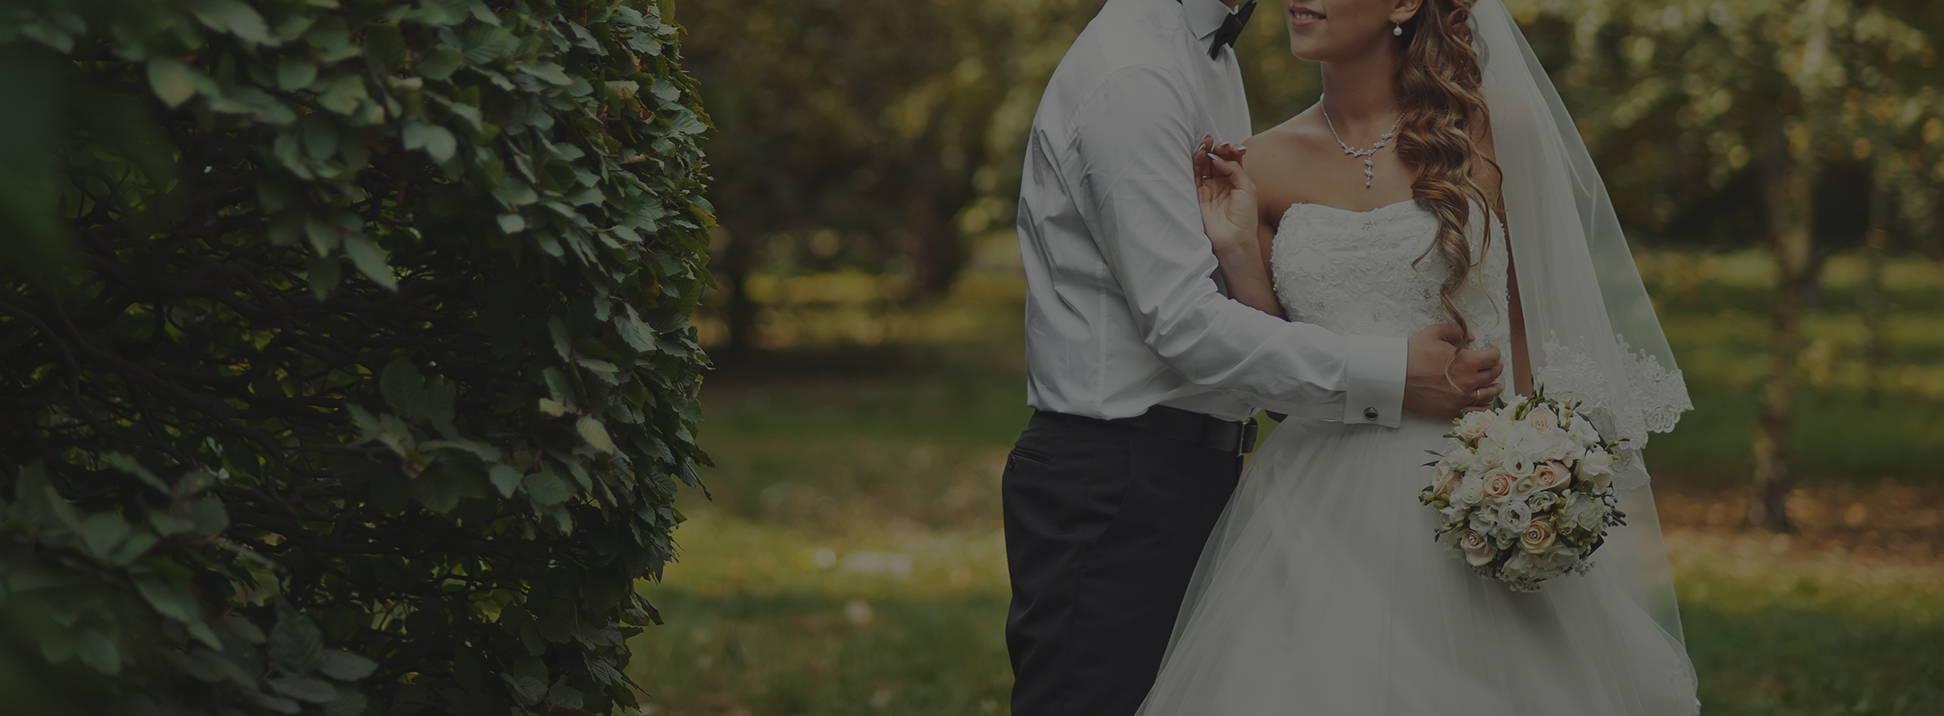 Wedding Groom and Bride embracing near greenery